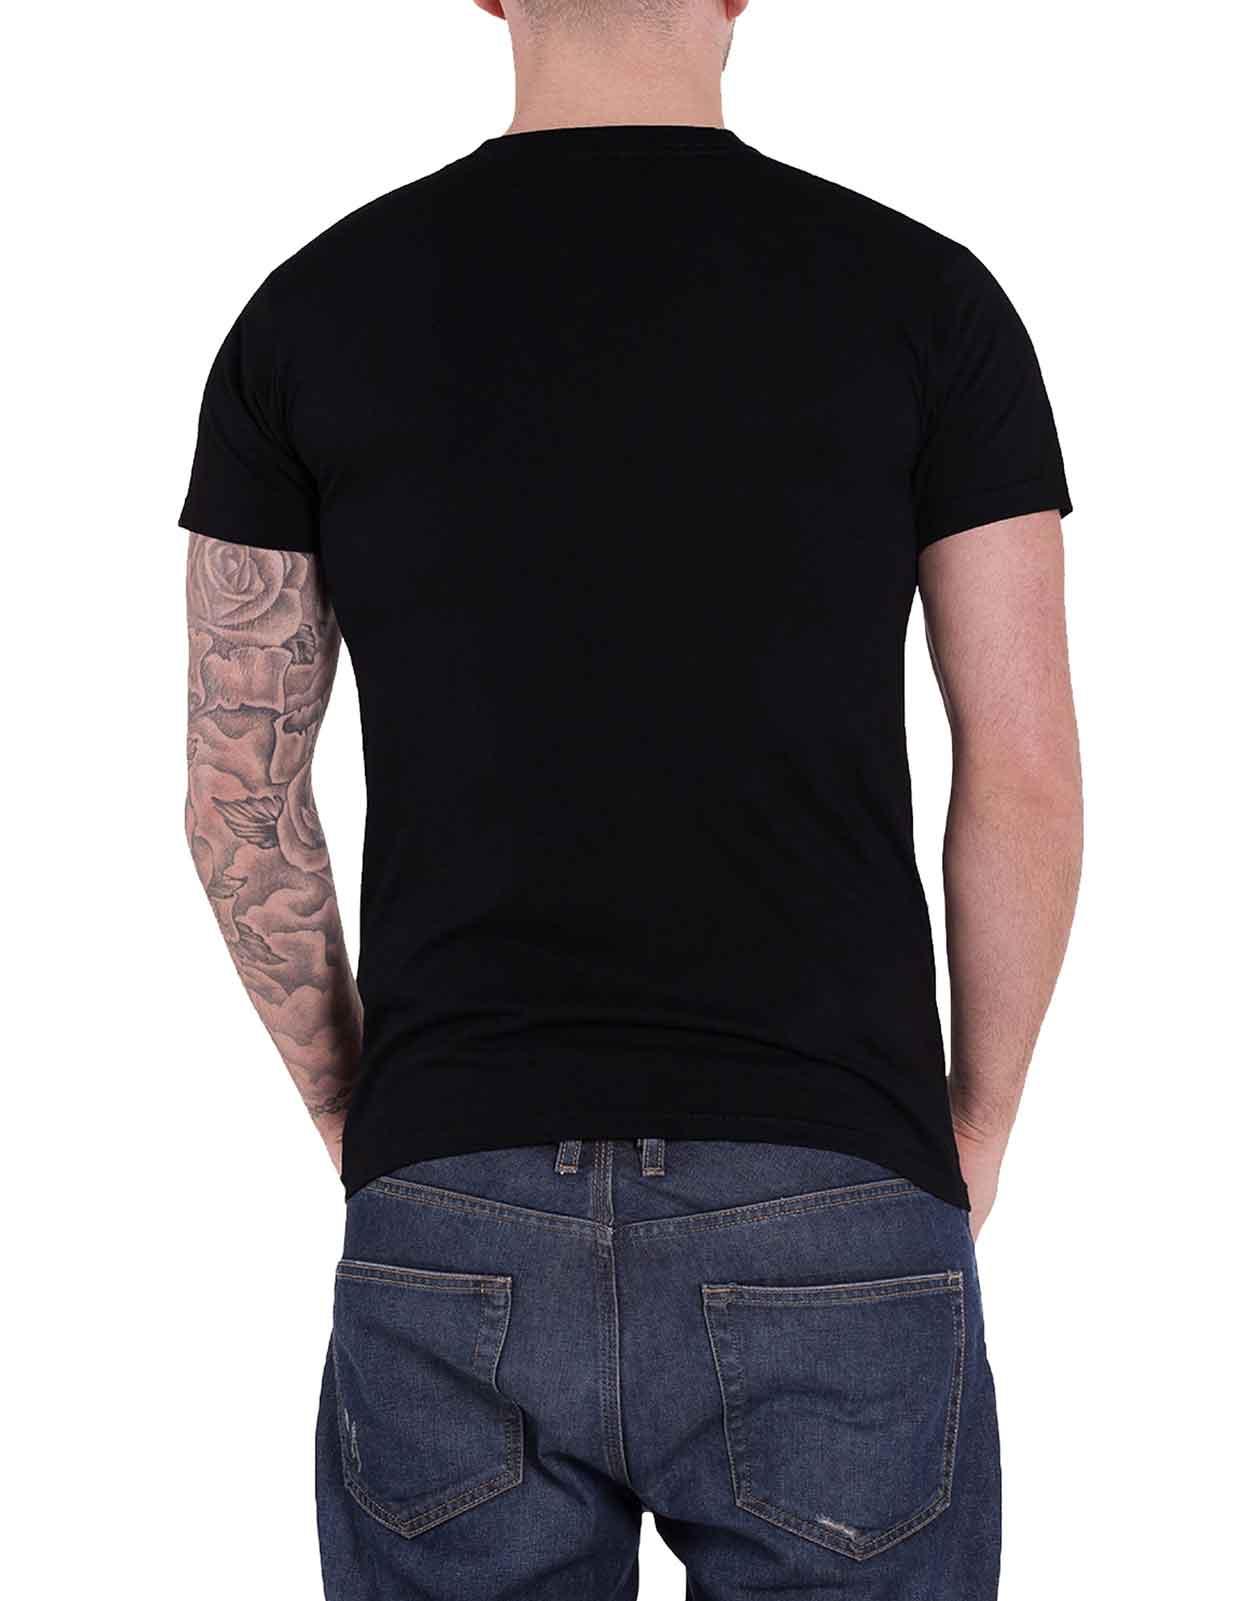 Official Black Veil Brides T Shirt Andy Black BVB Badge band logo Mens New